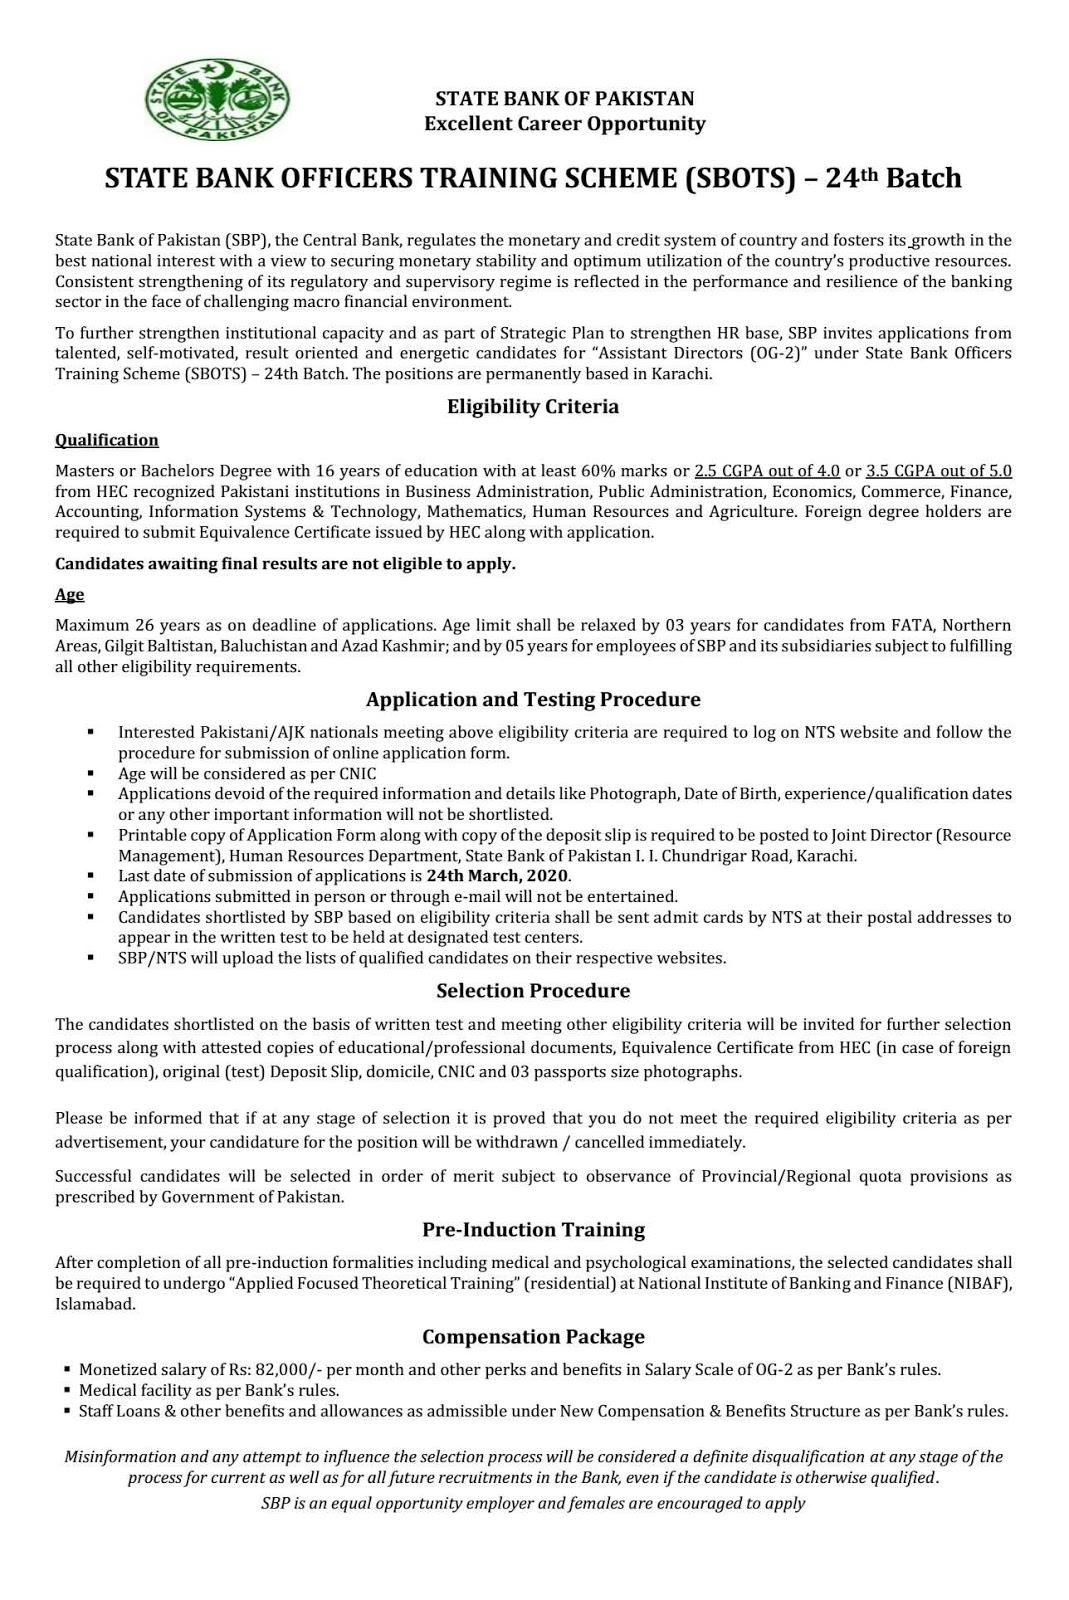 State Bank Officers Training Scheme (SBOTS) 24th Batch (Screening Test) 2020